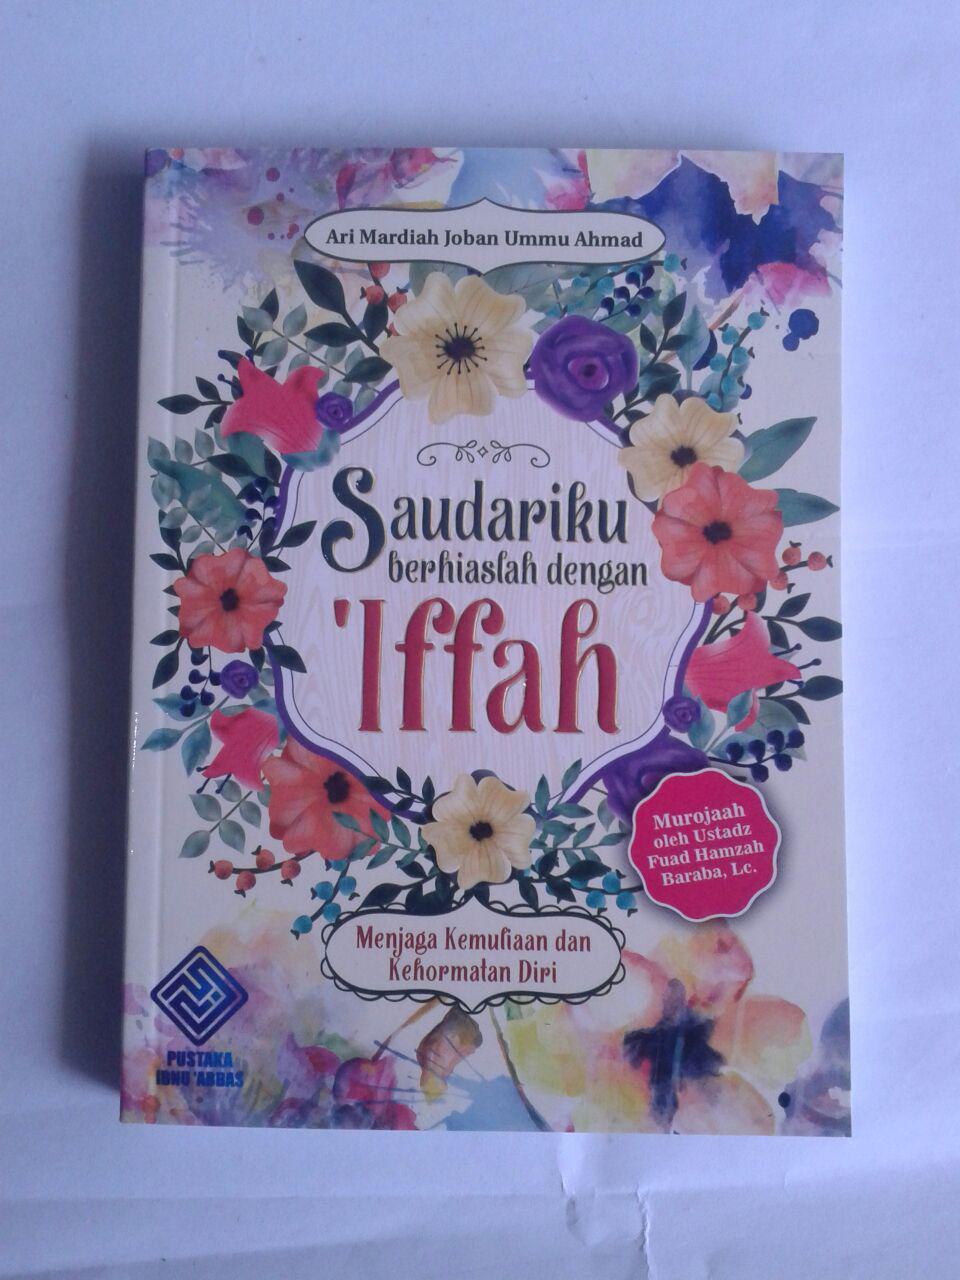 Buku Saudariku Berhiaslah Dengan Iffah Kehormatan Diri cover 2